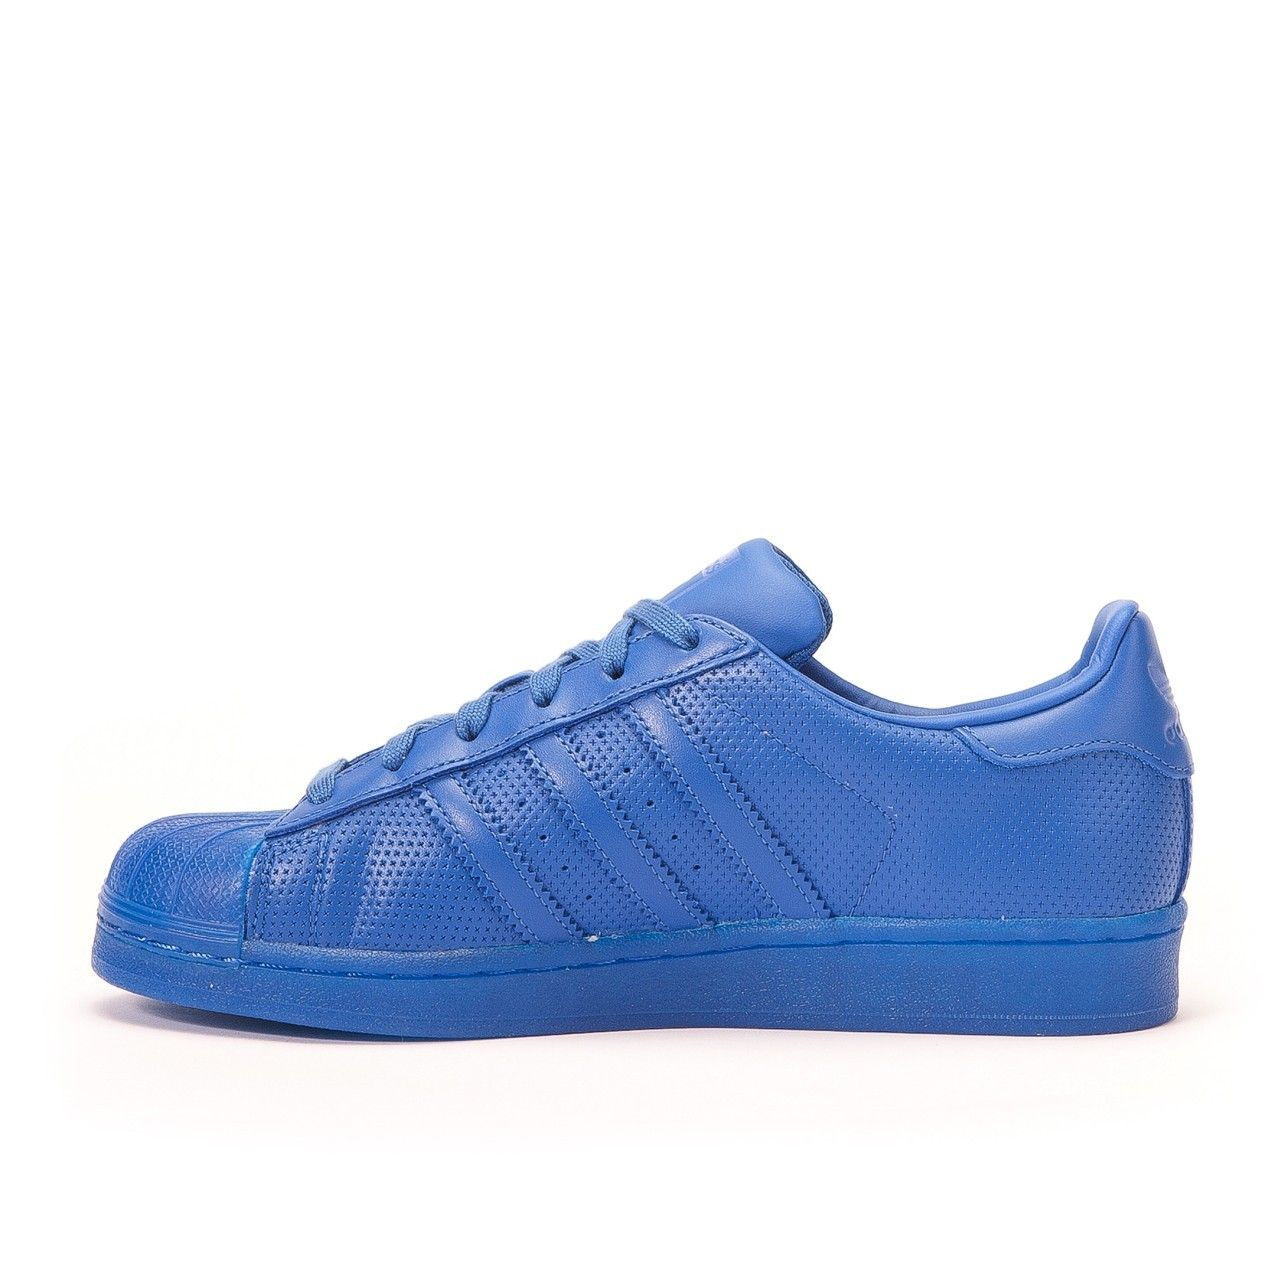 84c3539ce adidas Originals Superstar Adicolor EQT Blue Limited Edition S80327 ...